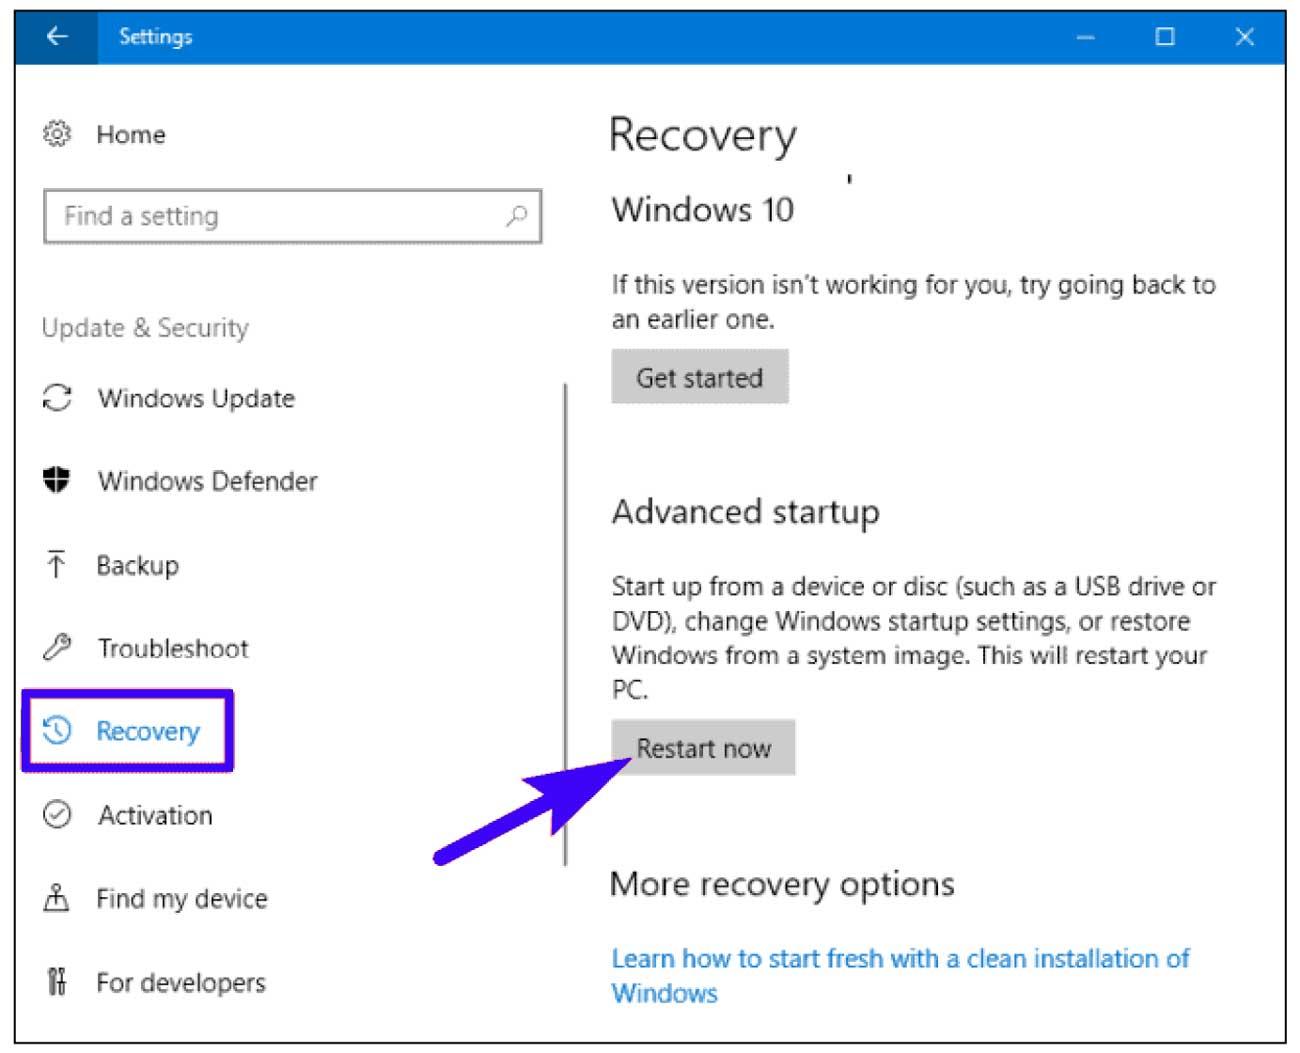 Recovery Windows 10